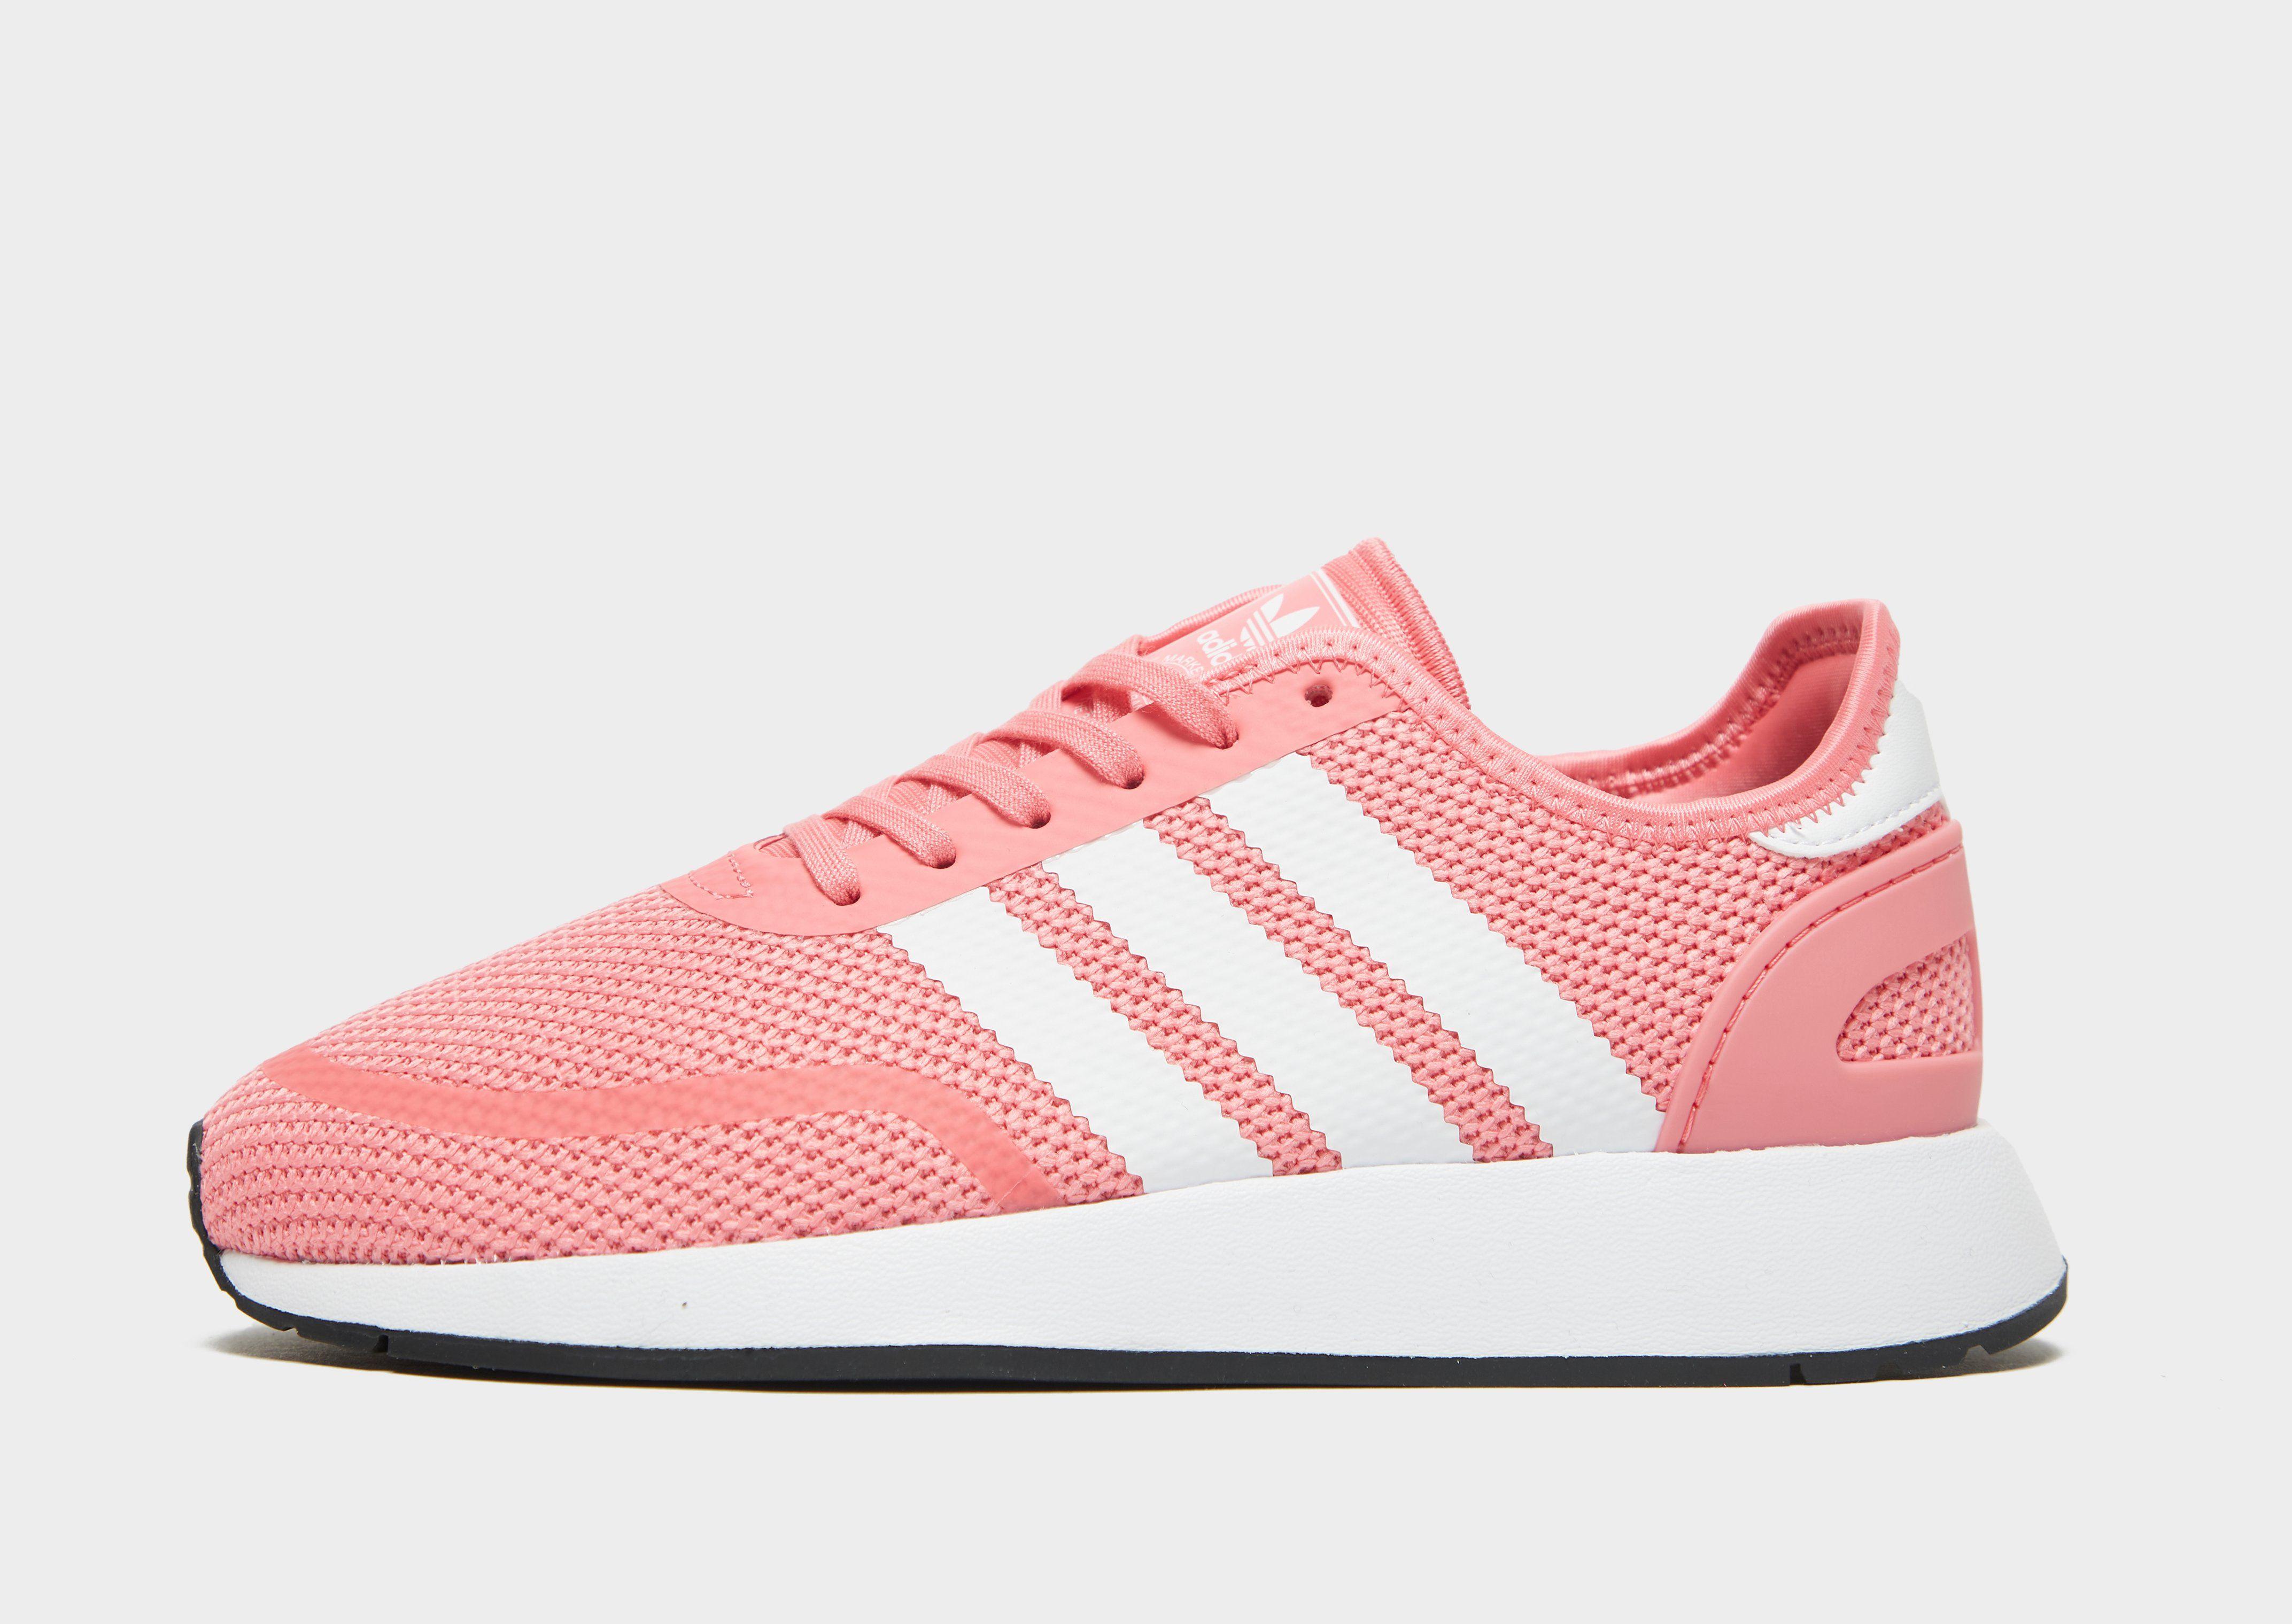 Nu 15% Korting: Sneakers ?n-5923? Maintenant, 15% De Réduction: Baskets N 5923? Adidas Originals Adidas Originals